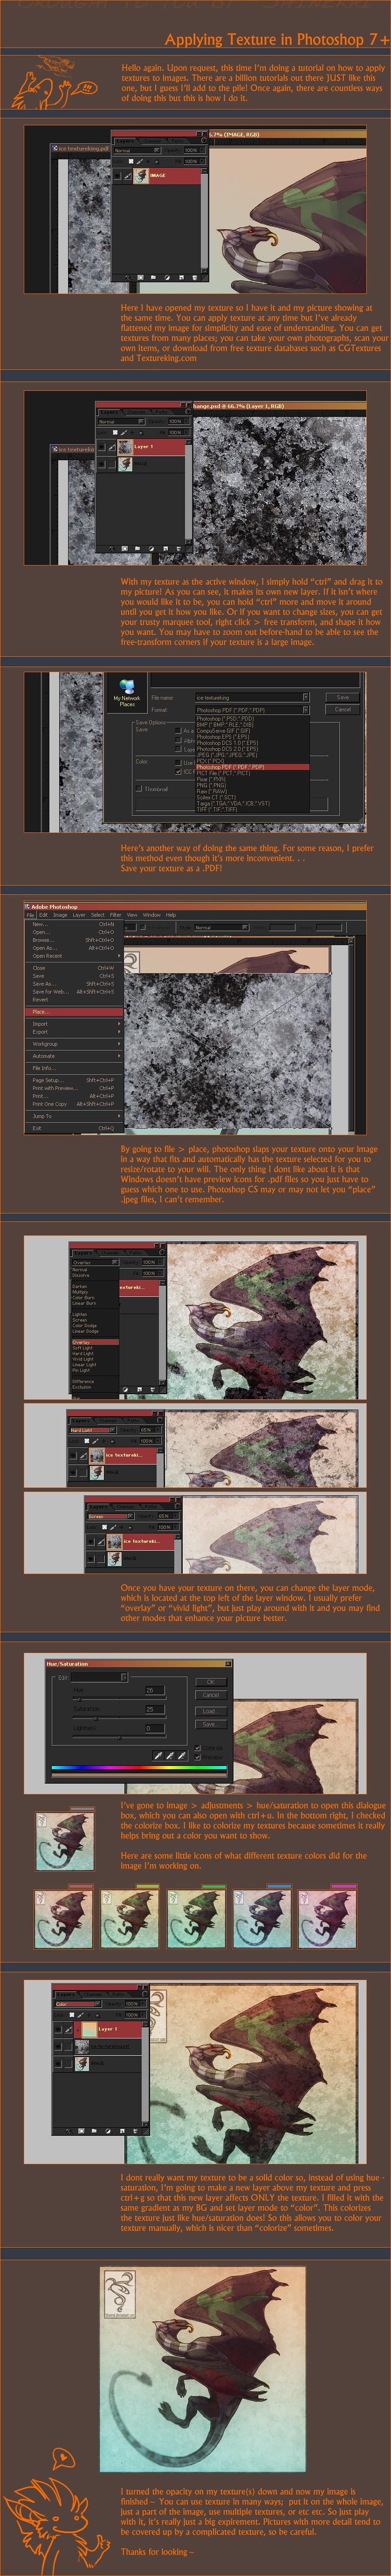 Tutorial: Applying Texture by Shinerai